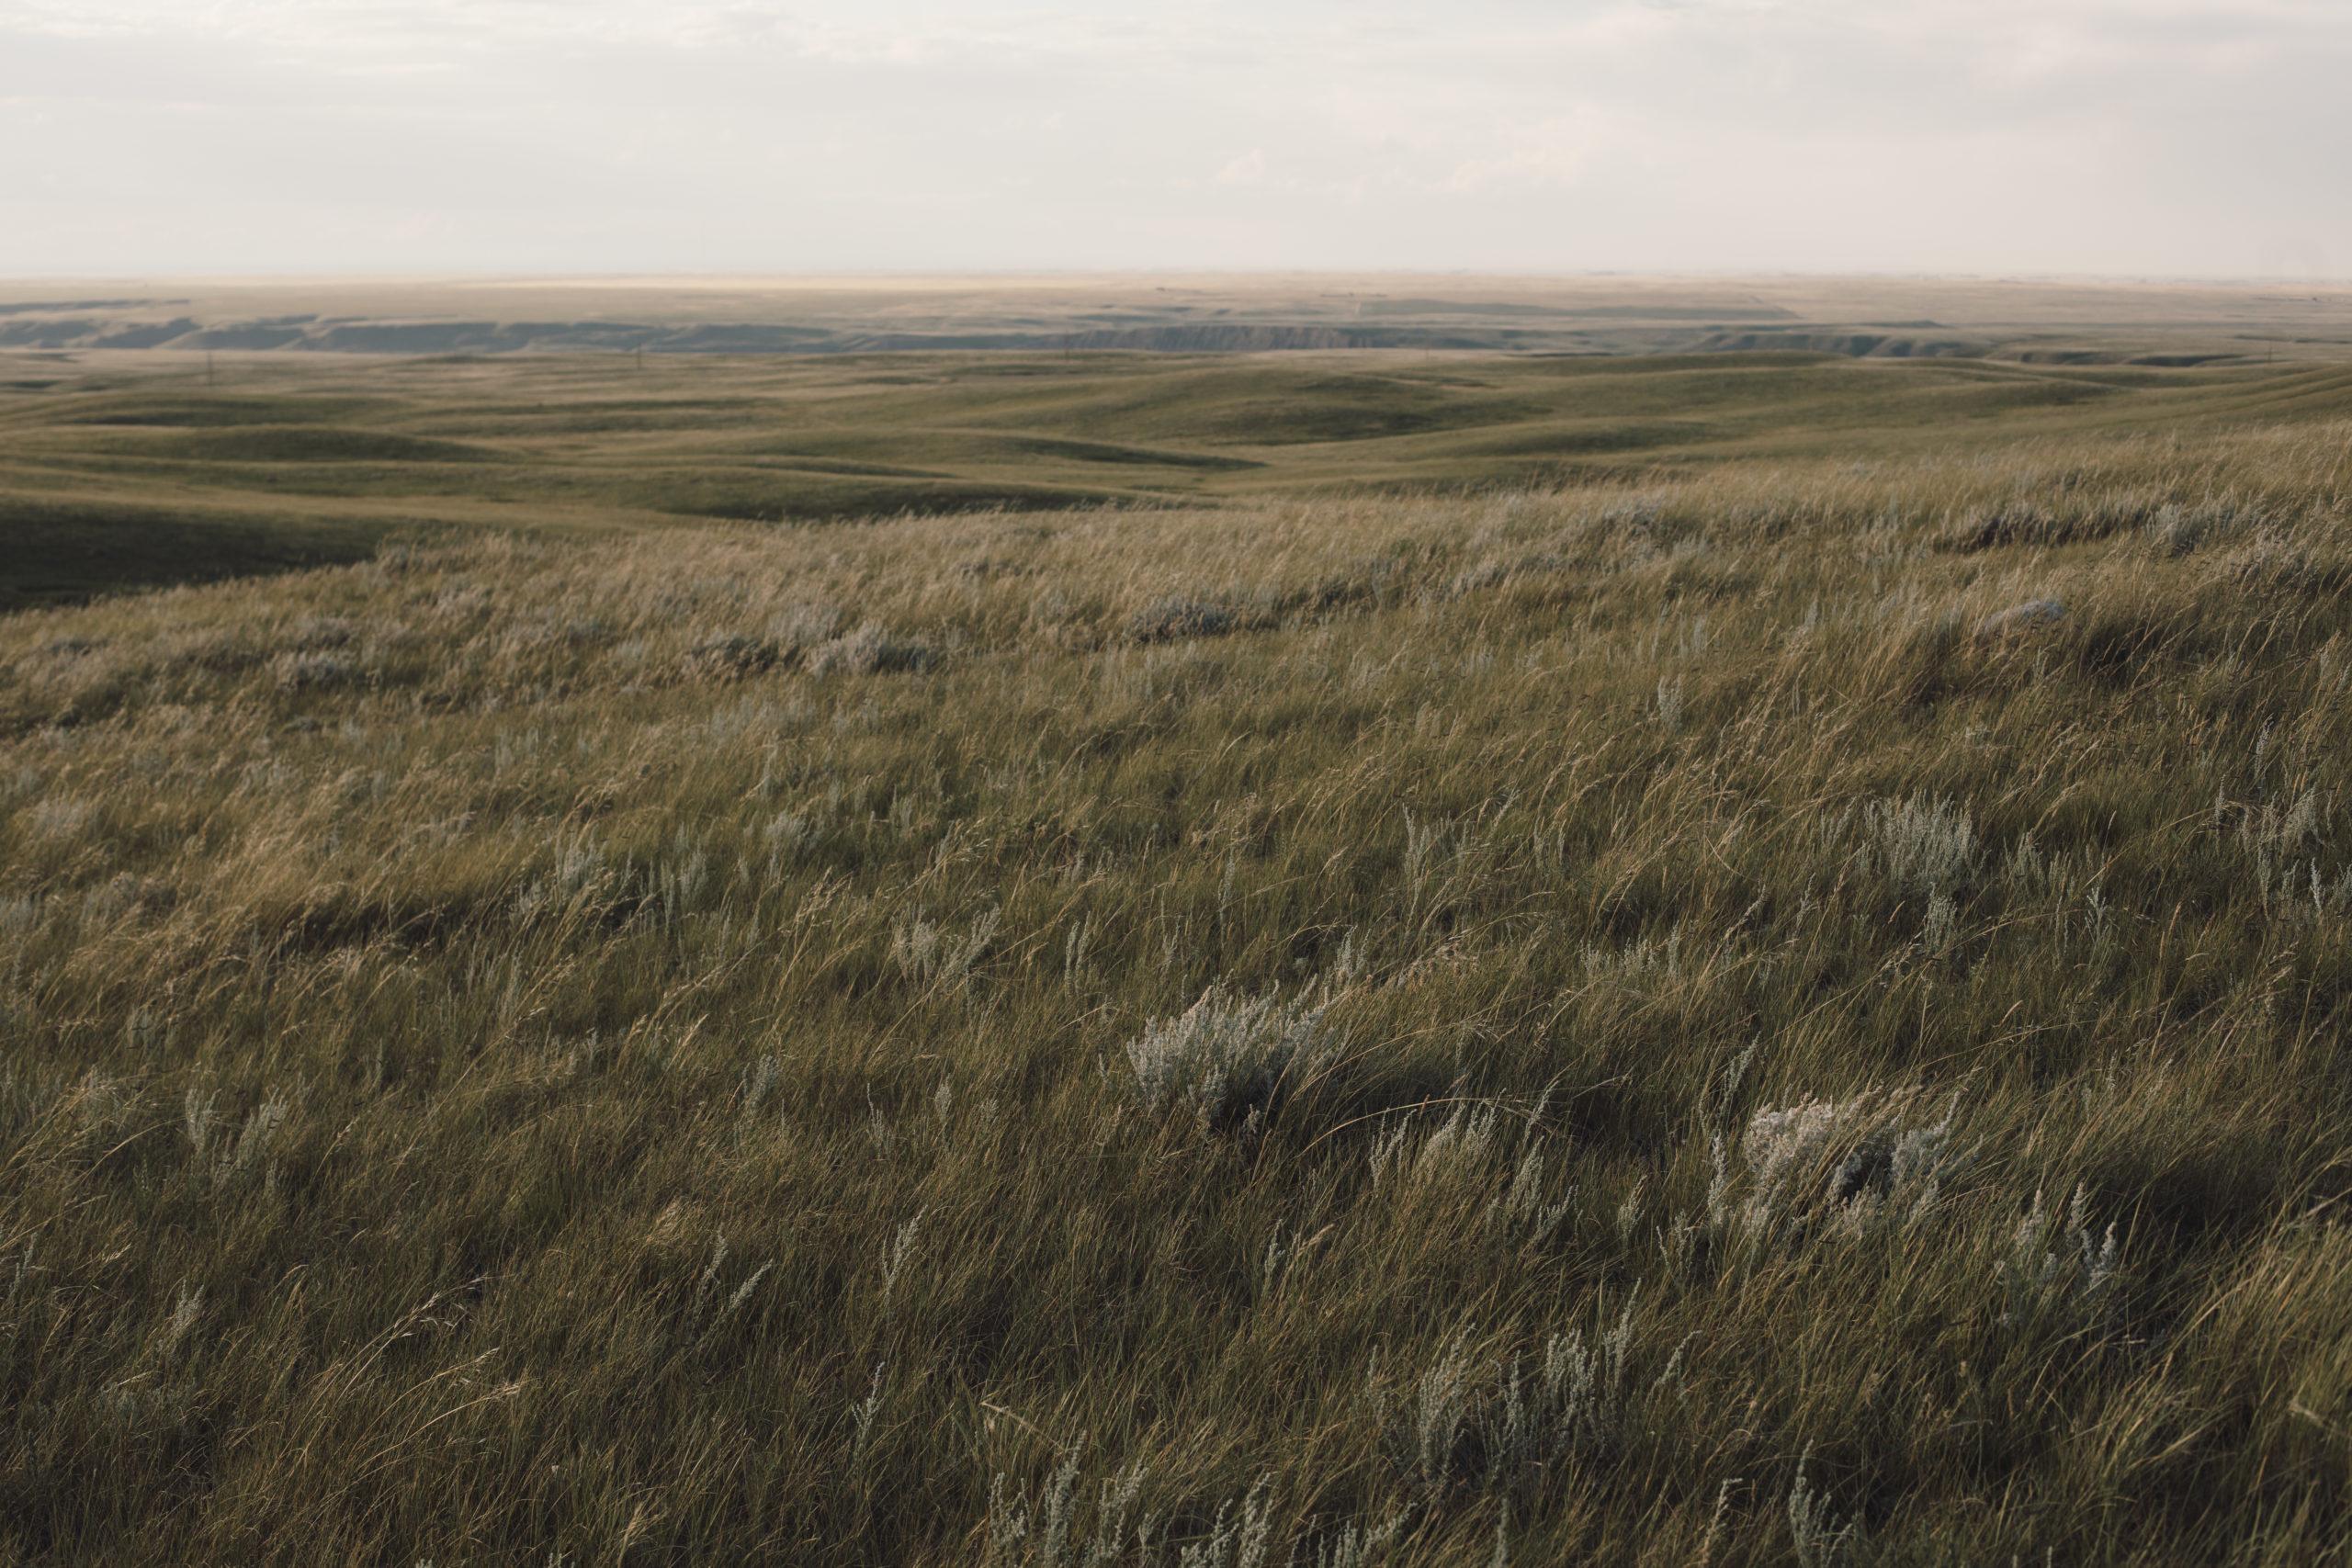 Grasslands09